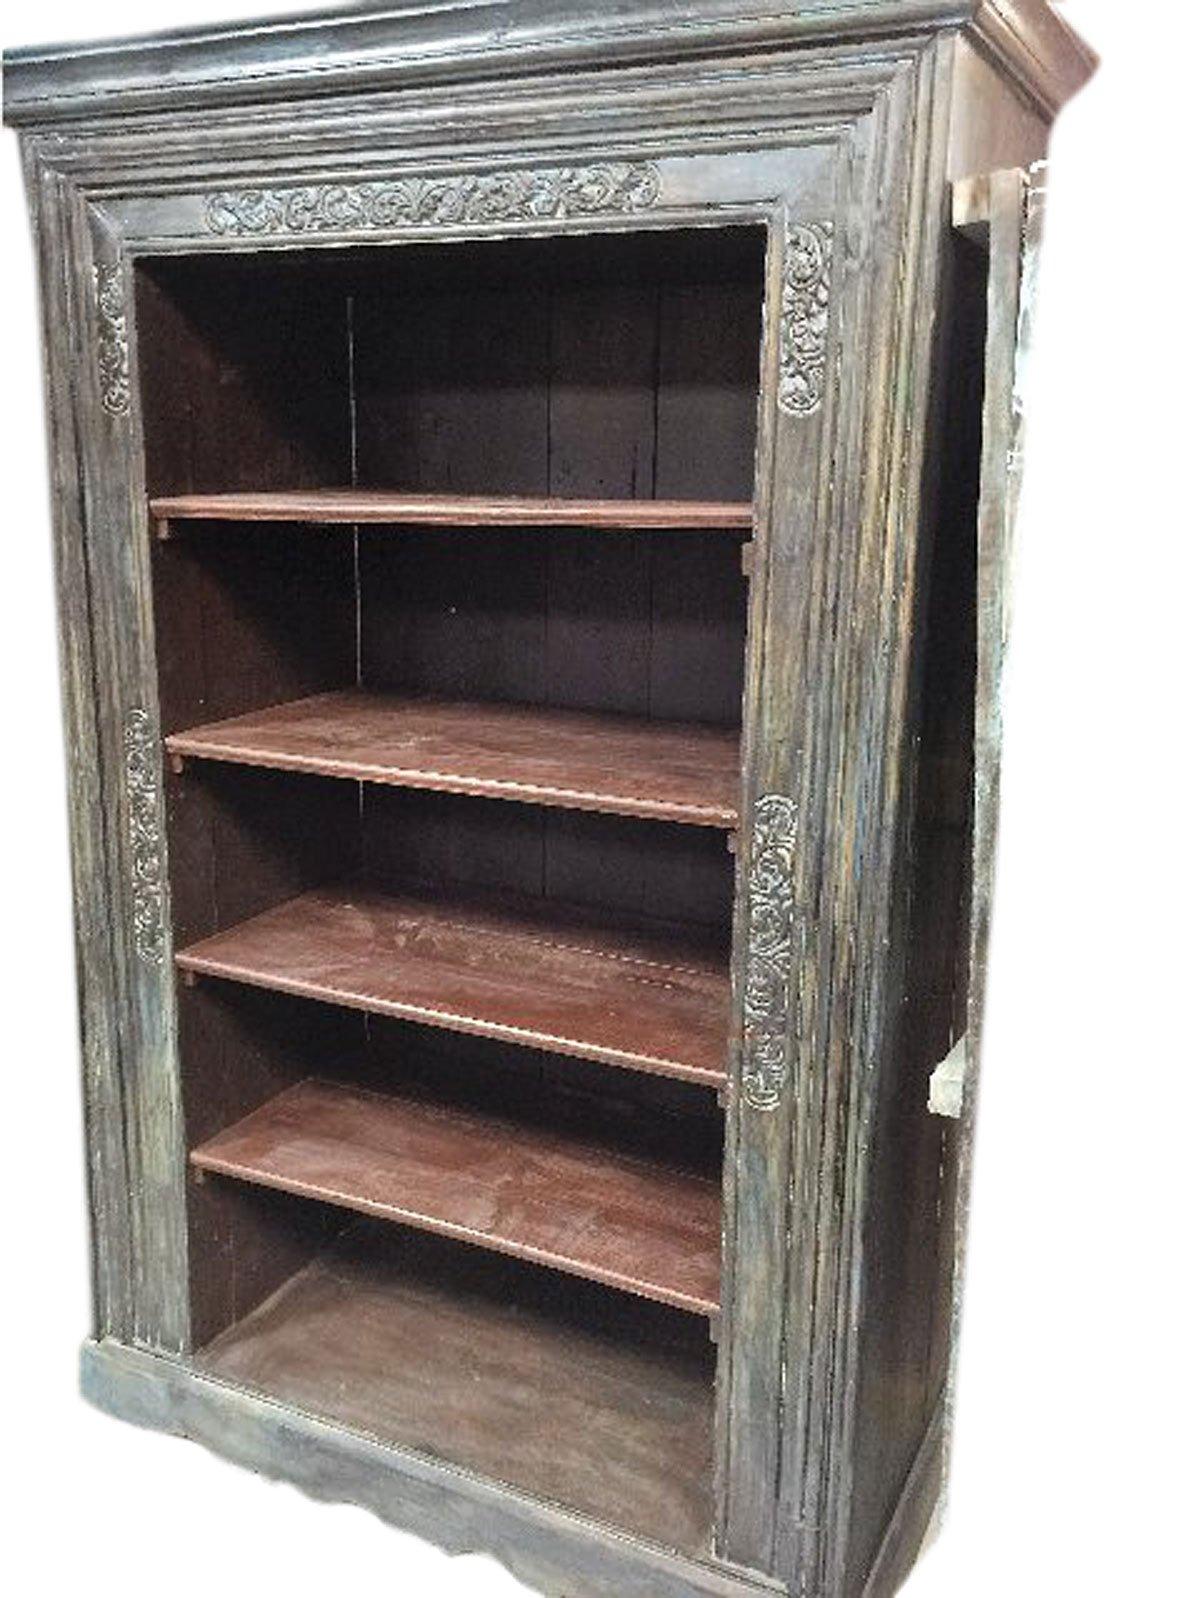 Mogulinterior Antique Indian Bookcase Hand Carved Book Shelf Furniture